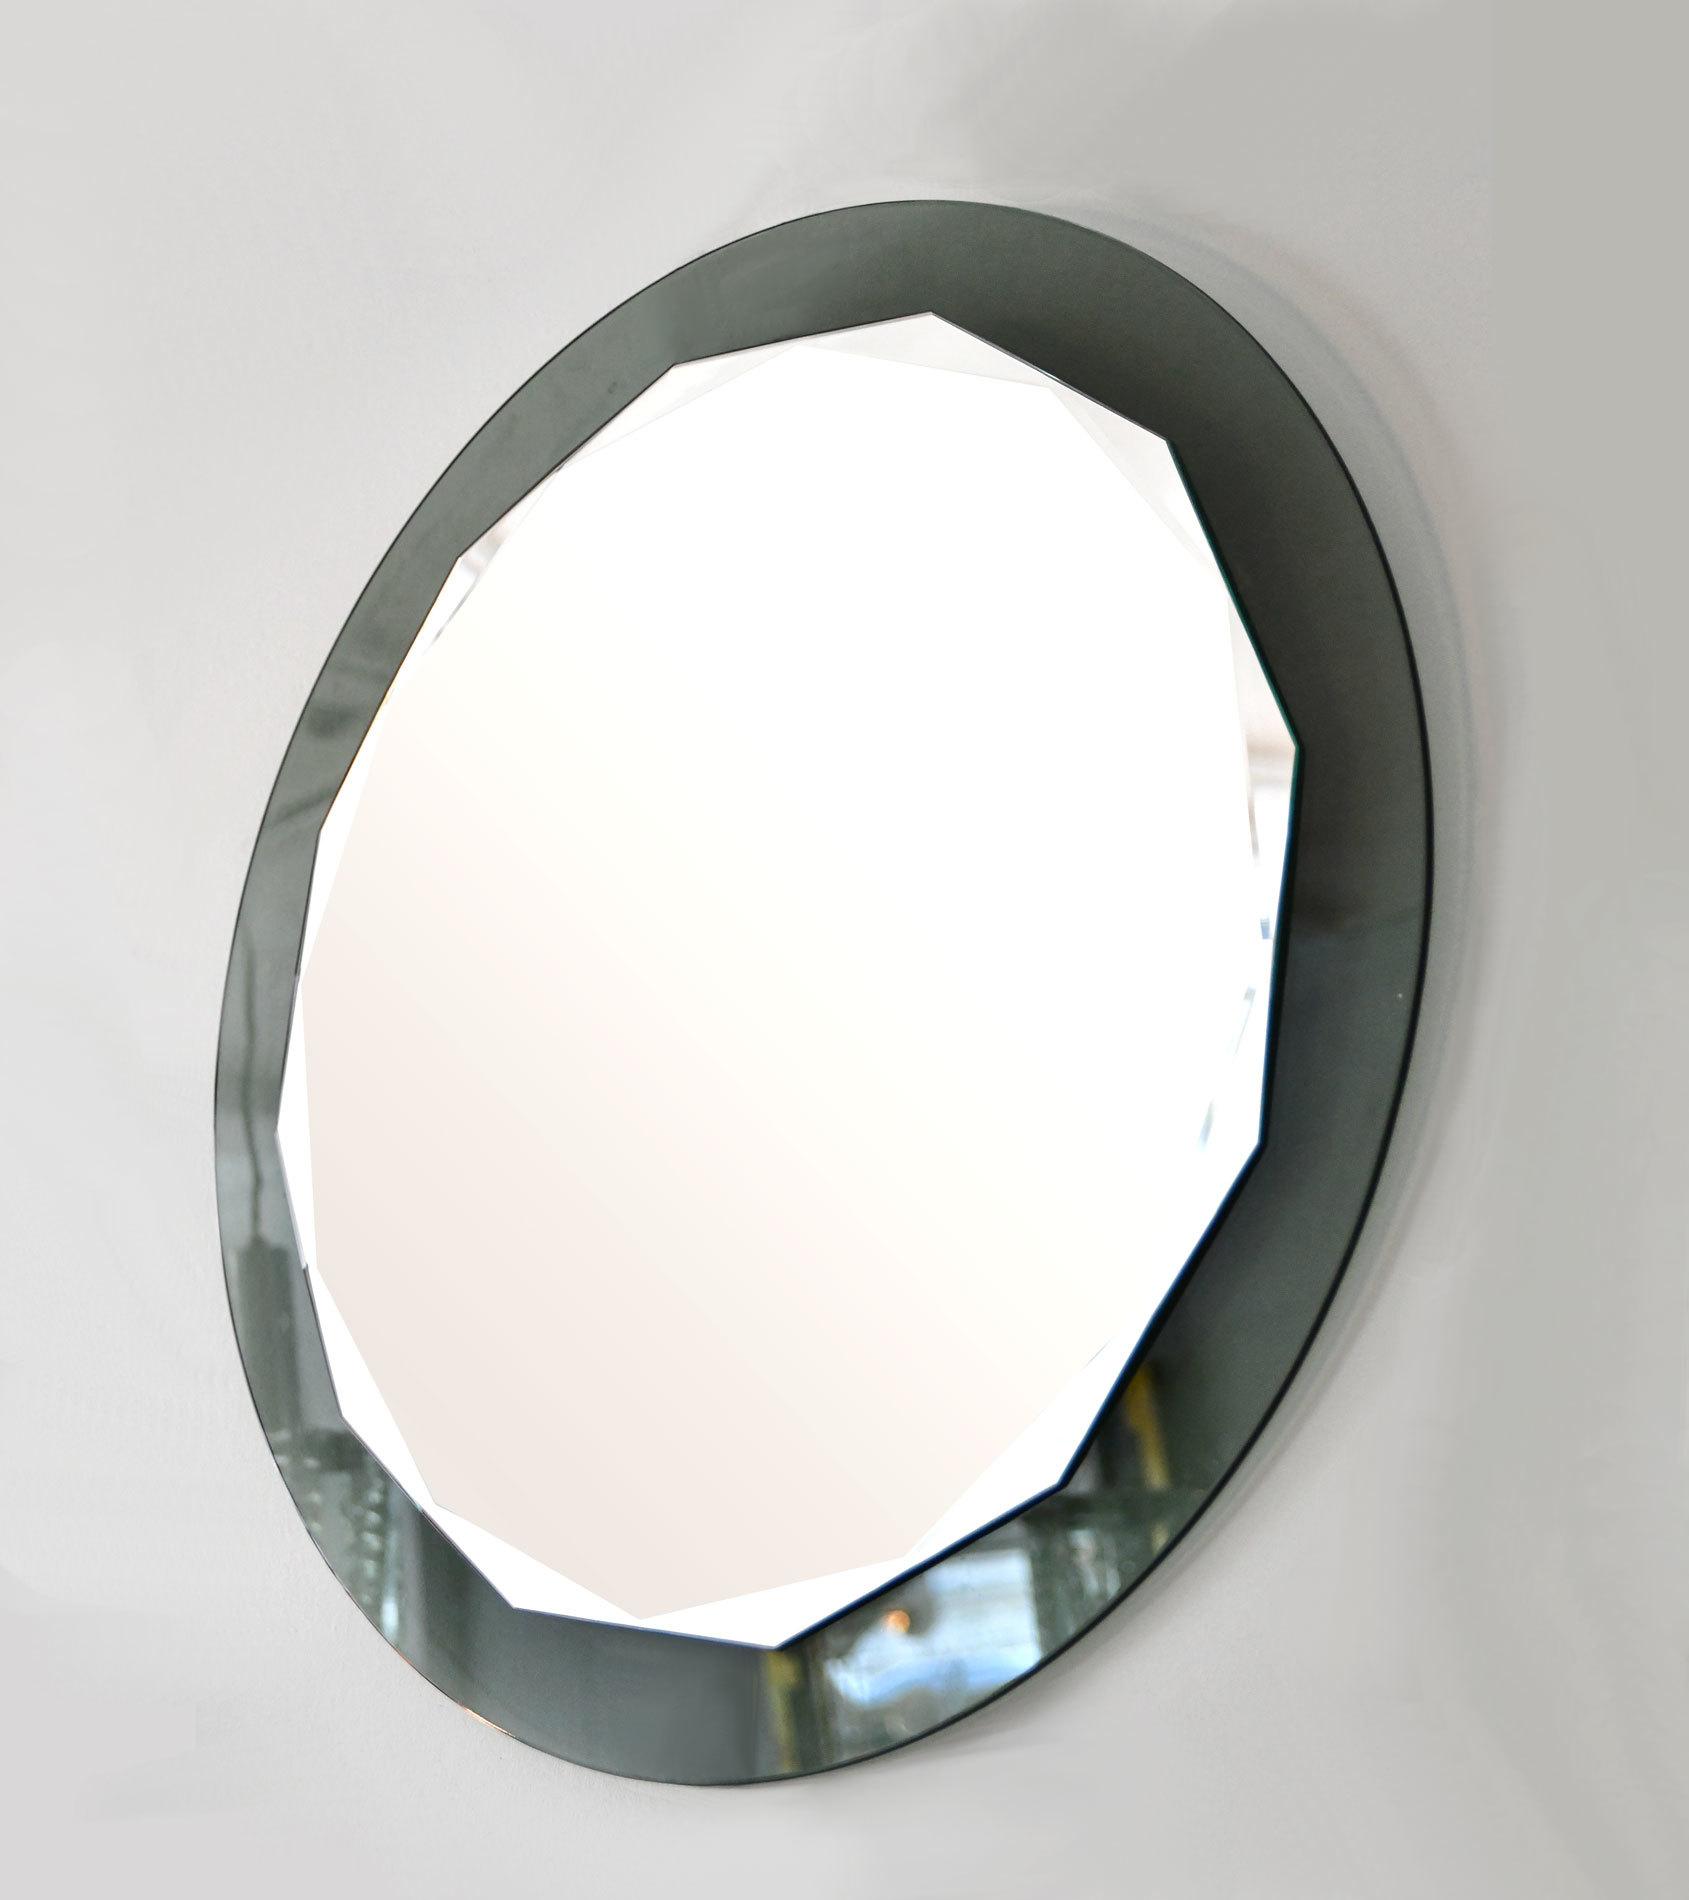 Cystal Arte Circular Mirror 02